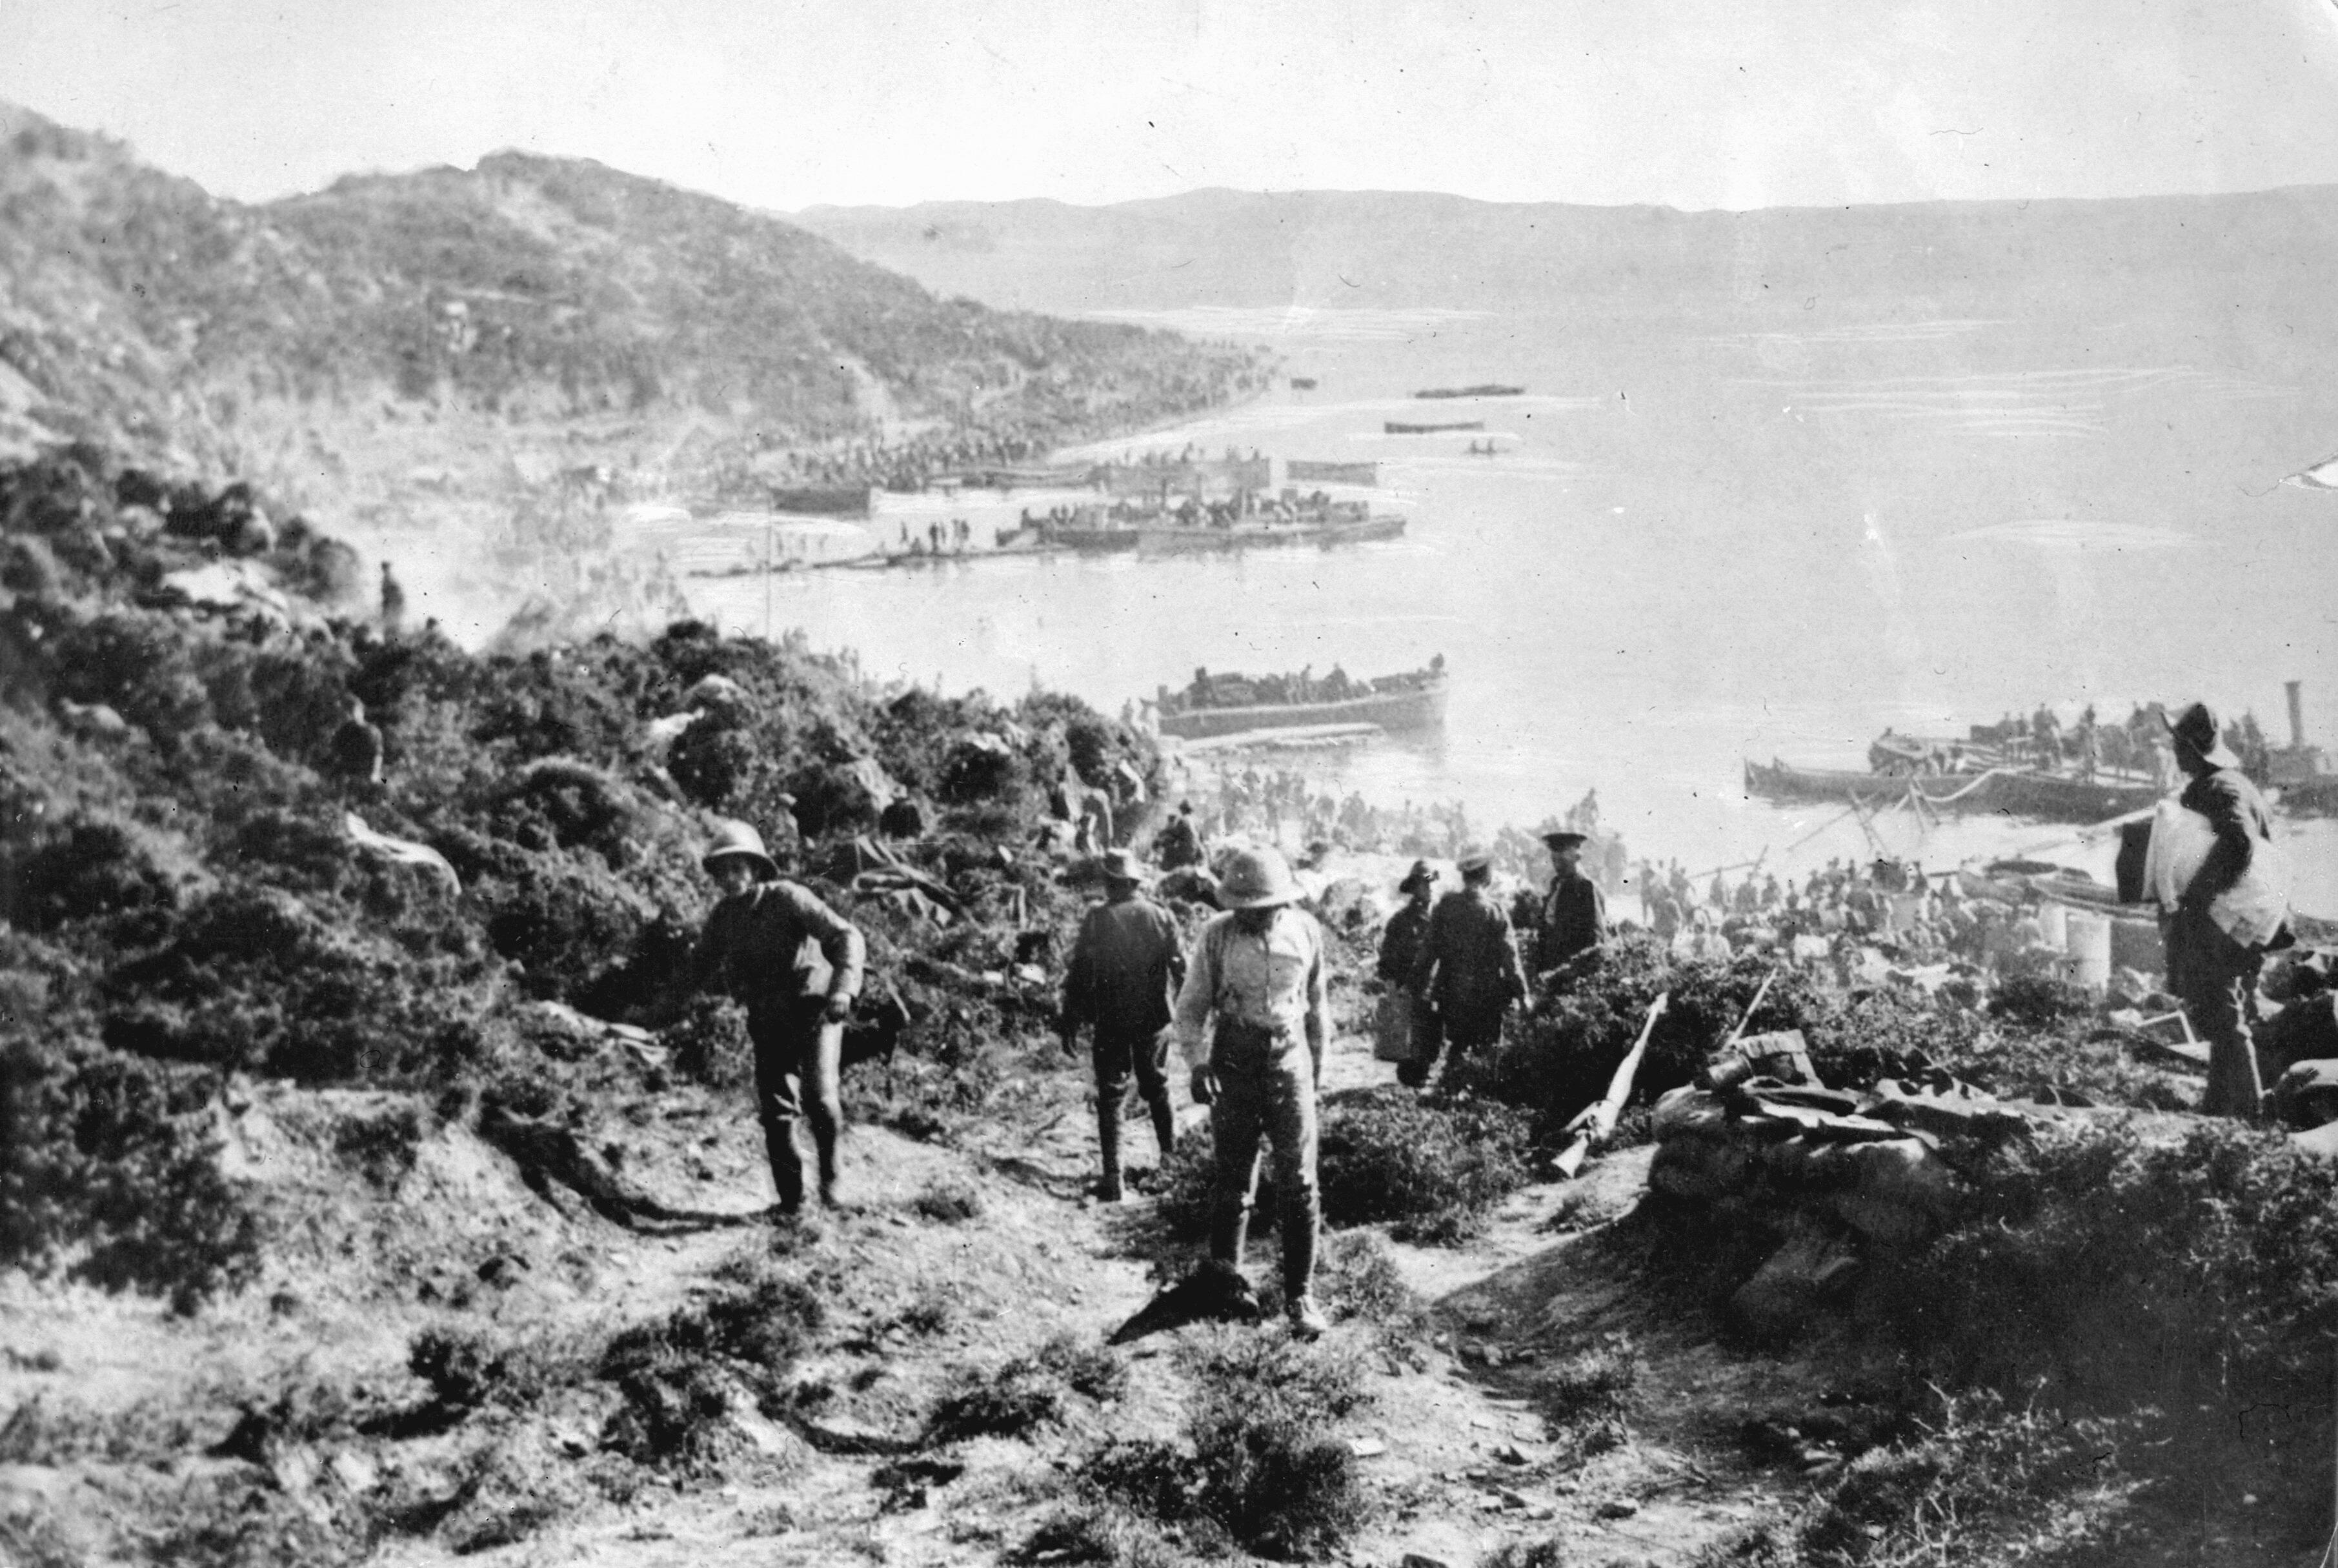 an analysis of robert bell year 9 by gallipoli 1915